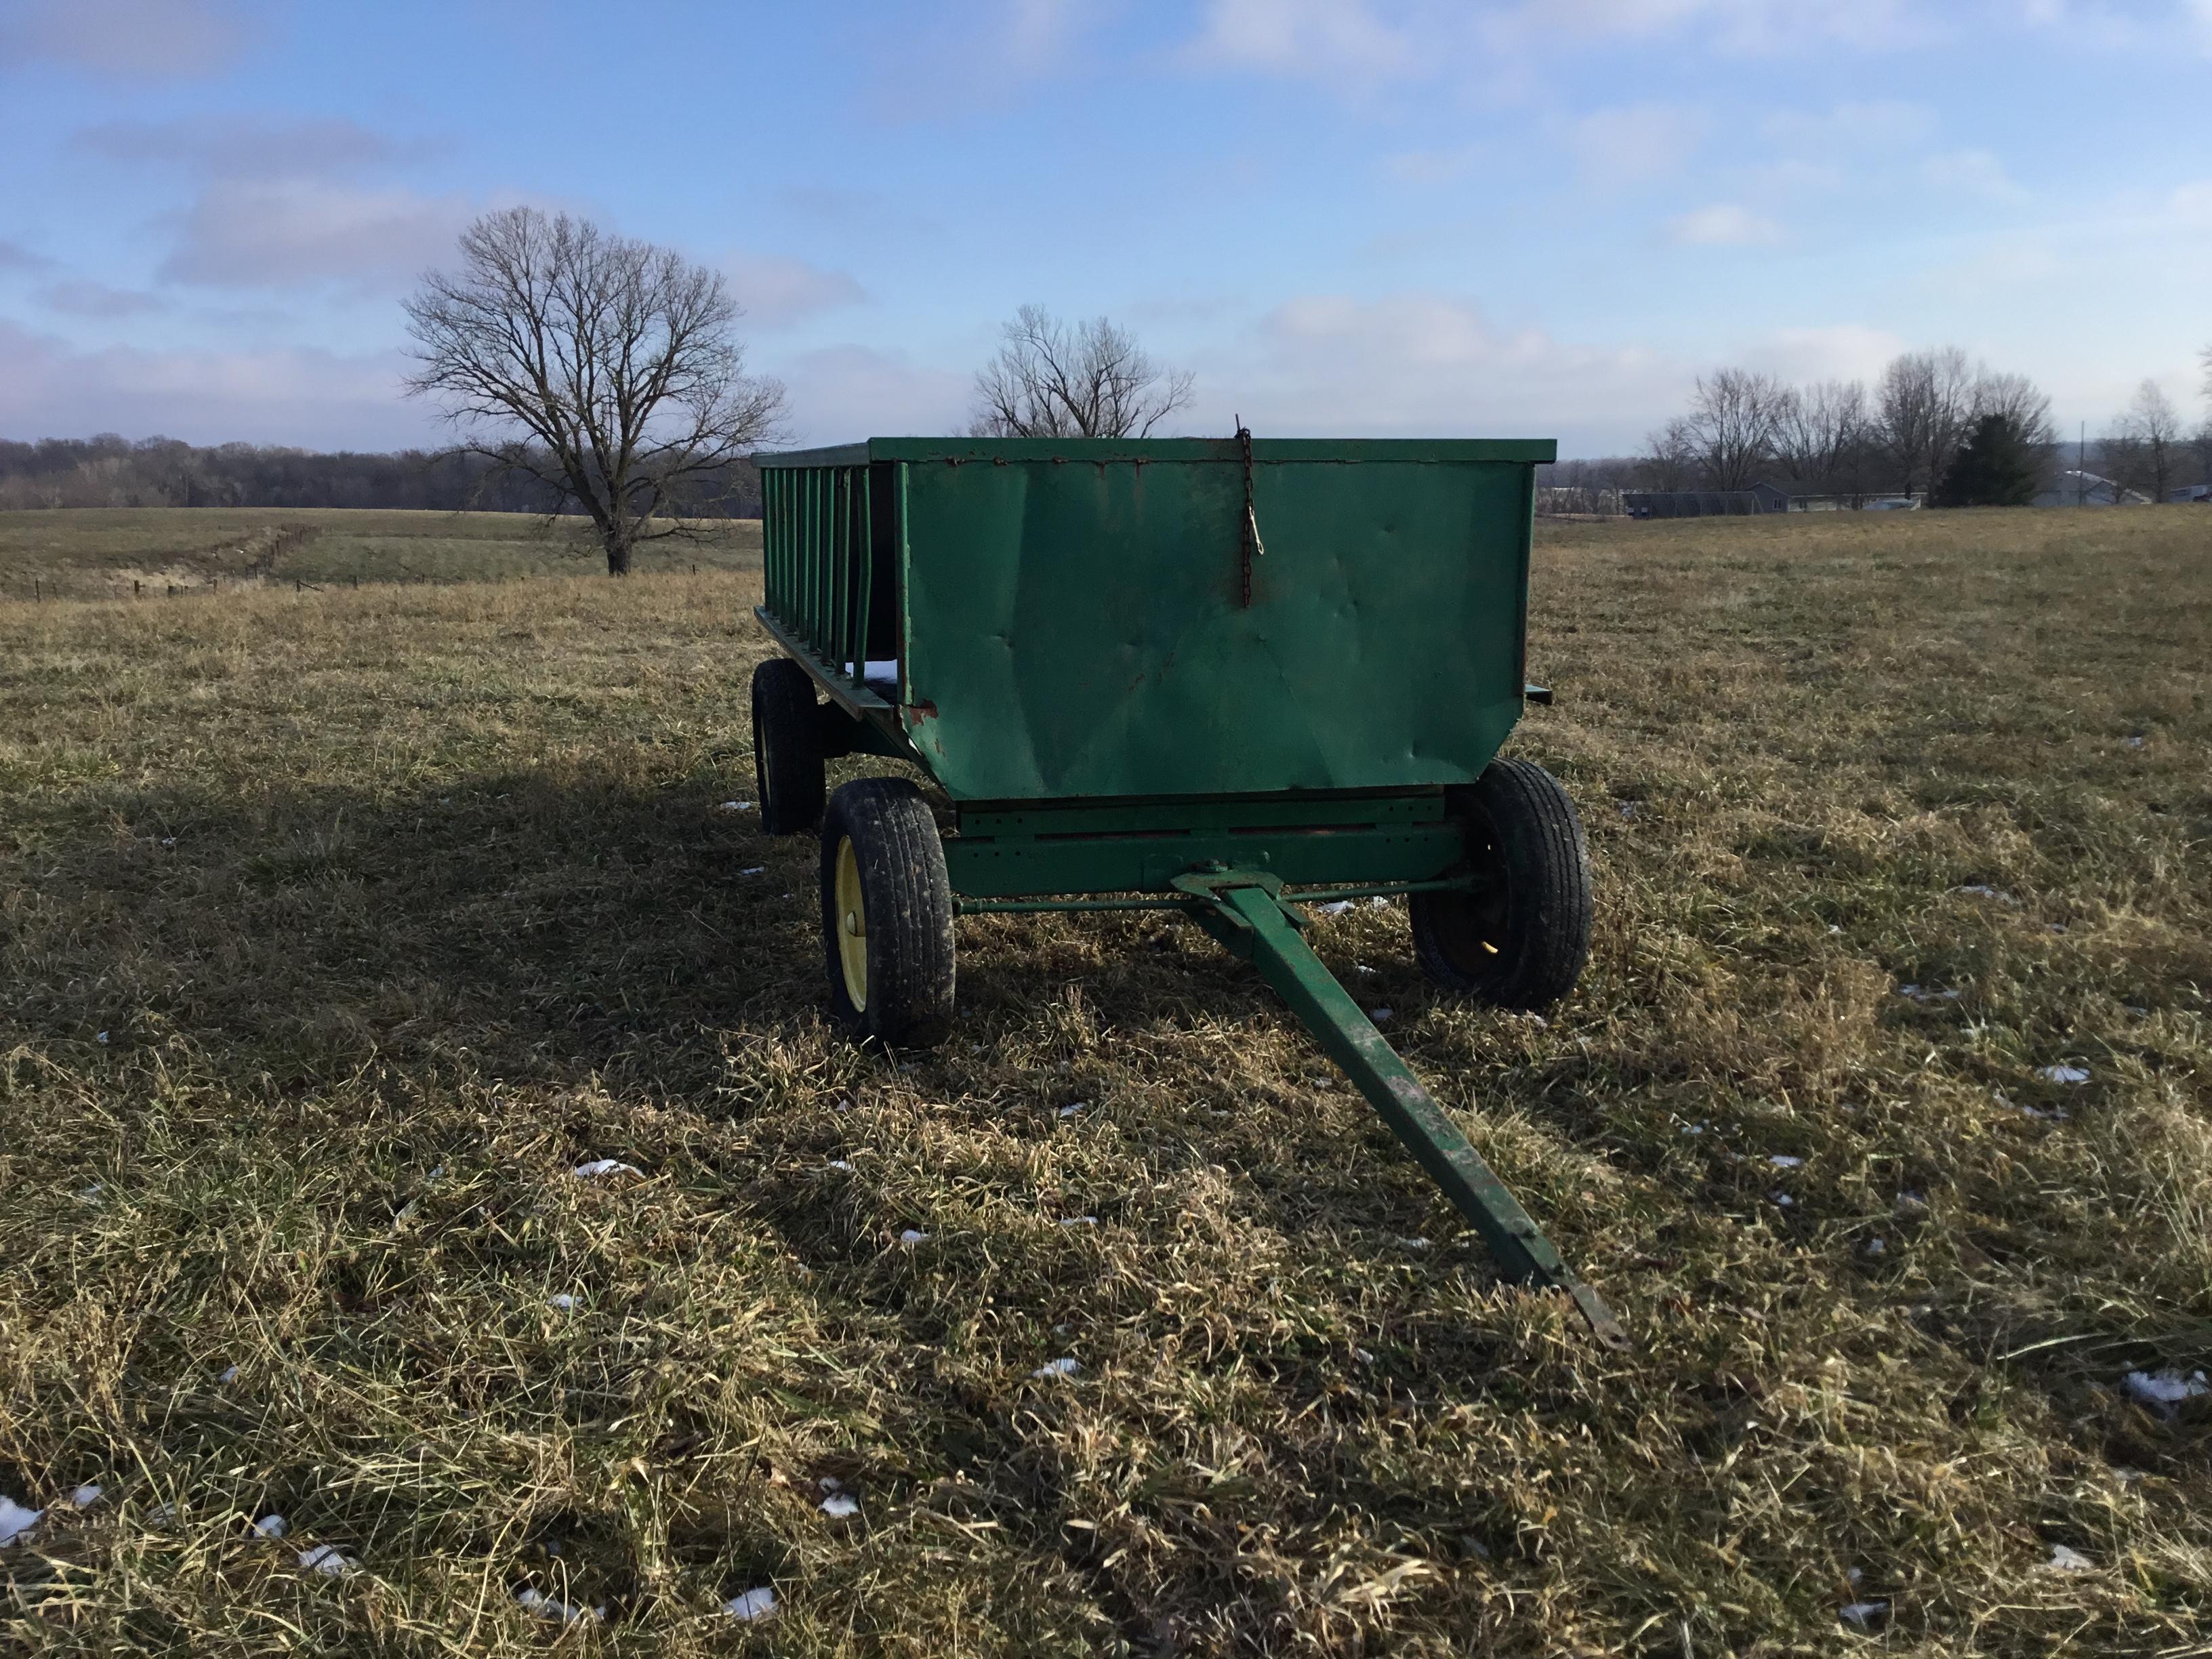 Lot 6 - Hay/Grain Feeder Wagon